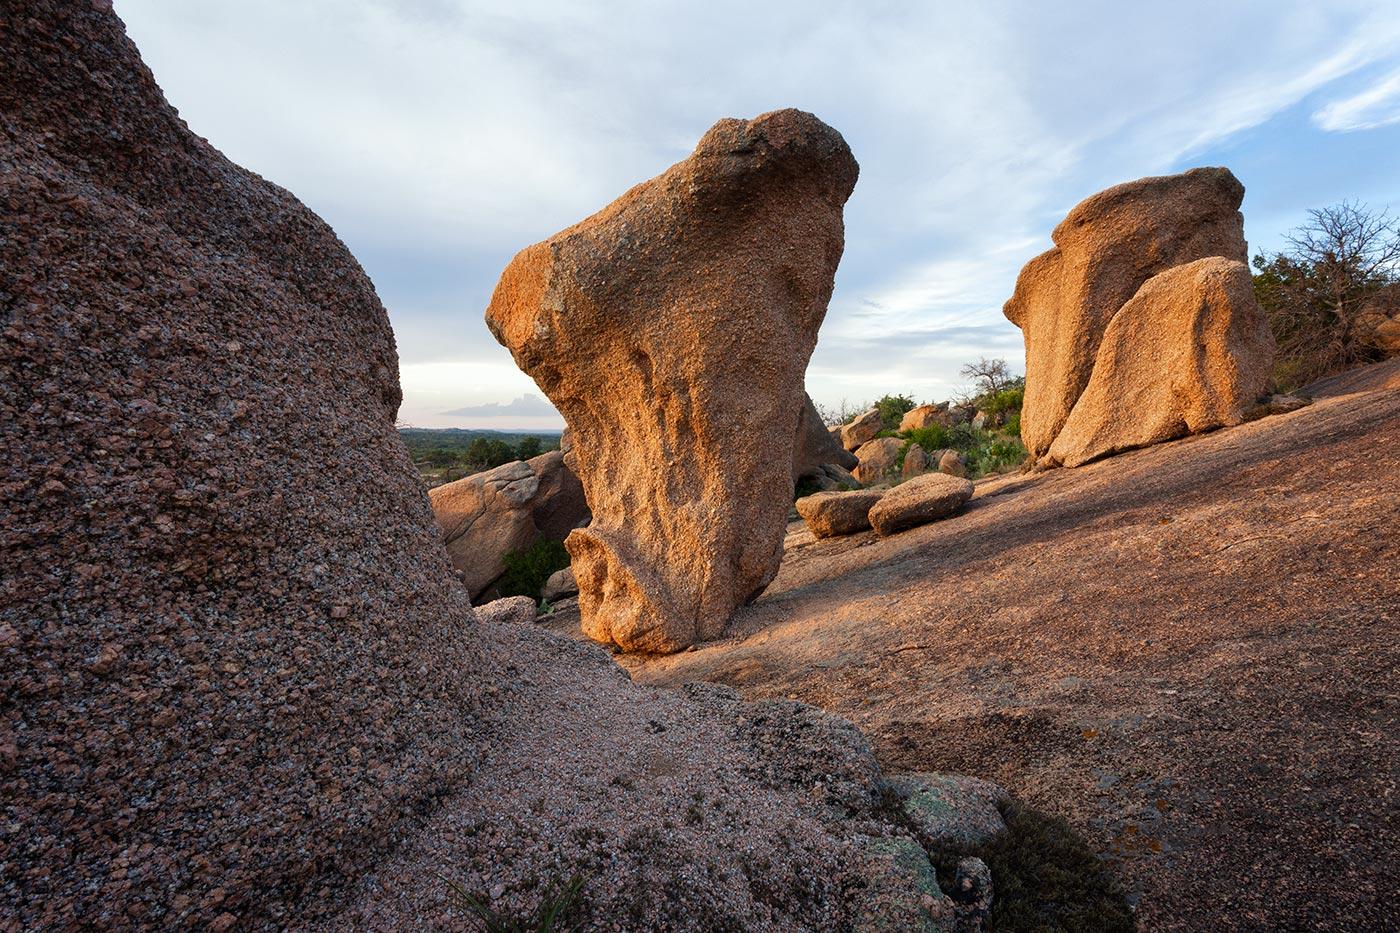 Enchanted-Rock-ABP-Boulders_Little-Rock.jpg